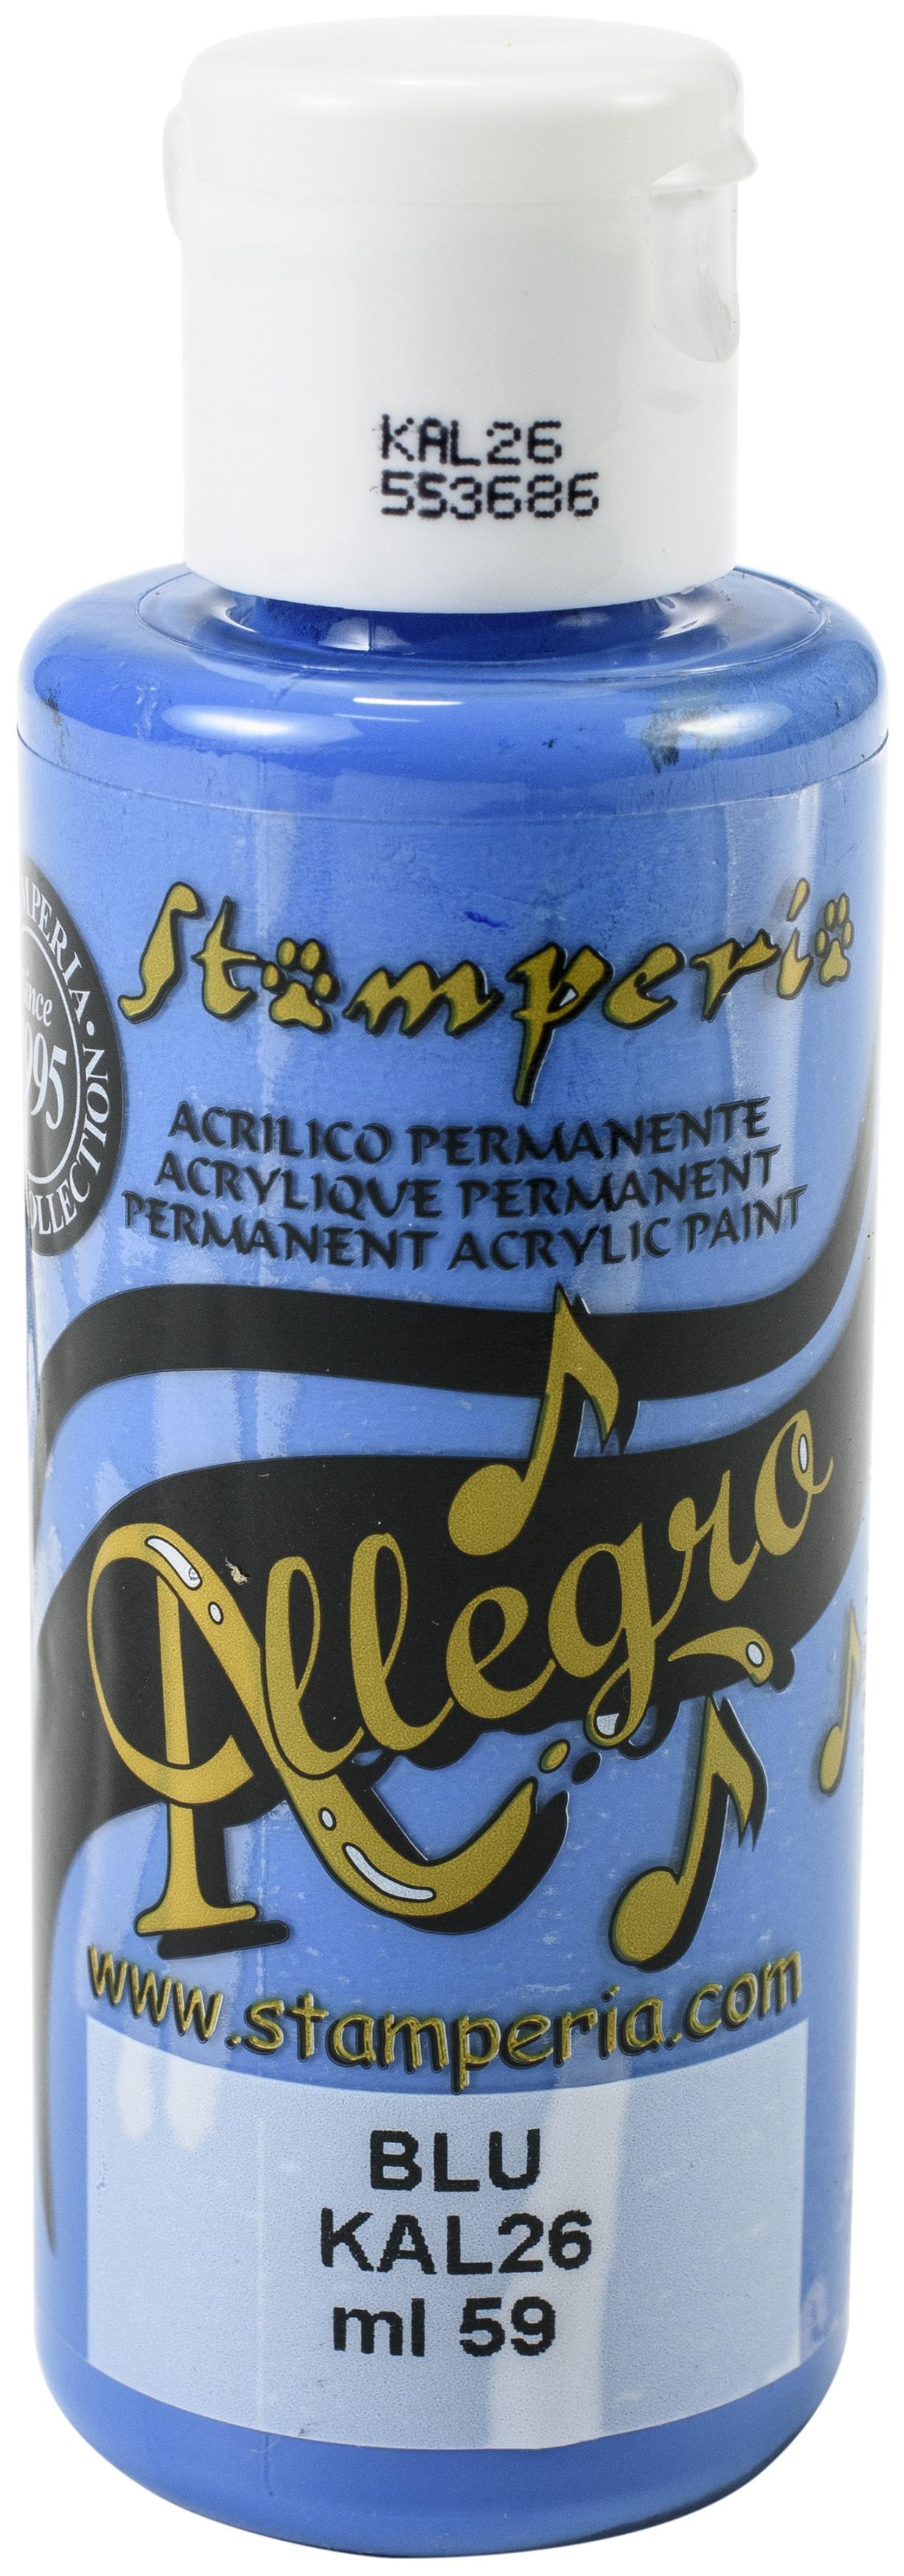 Allegro Paint - Blue